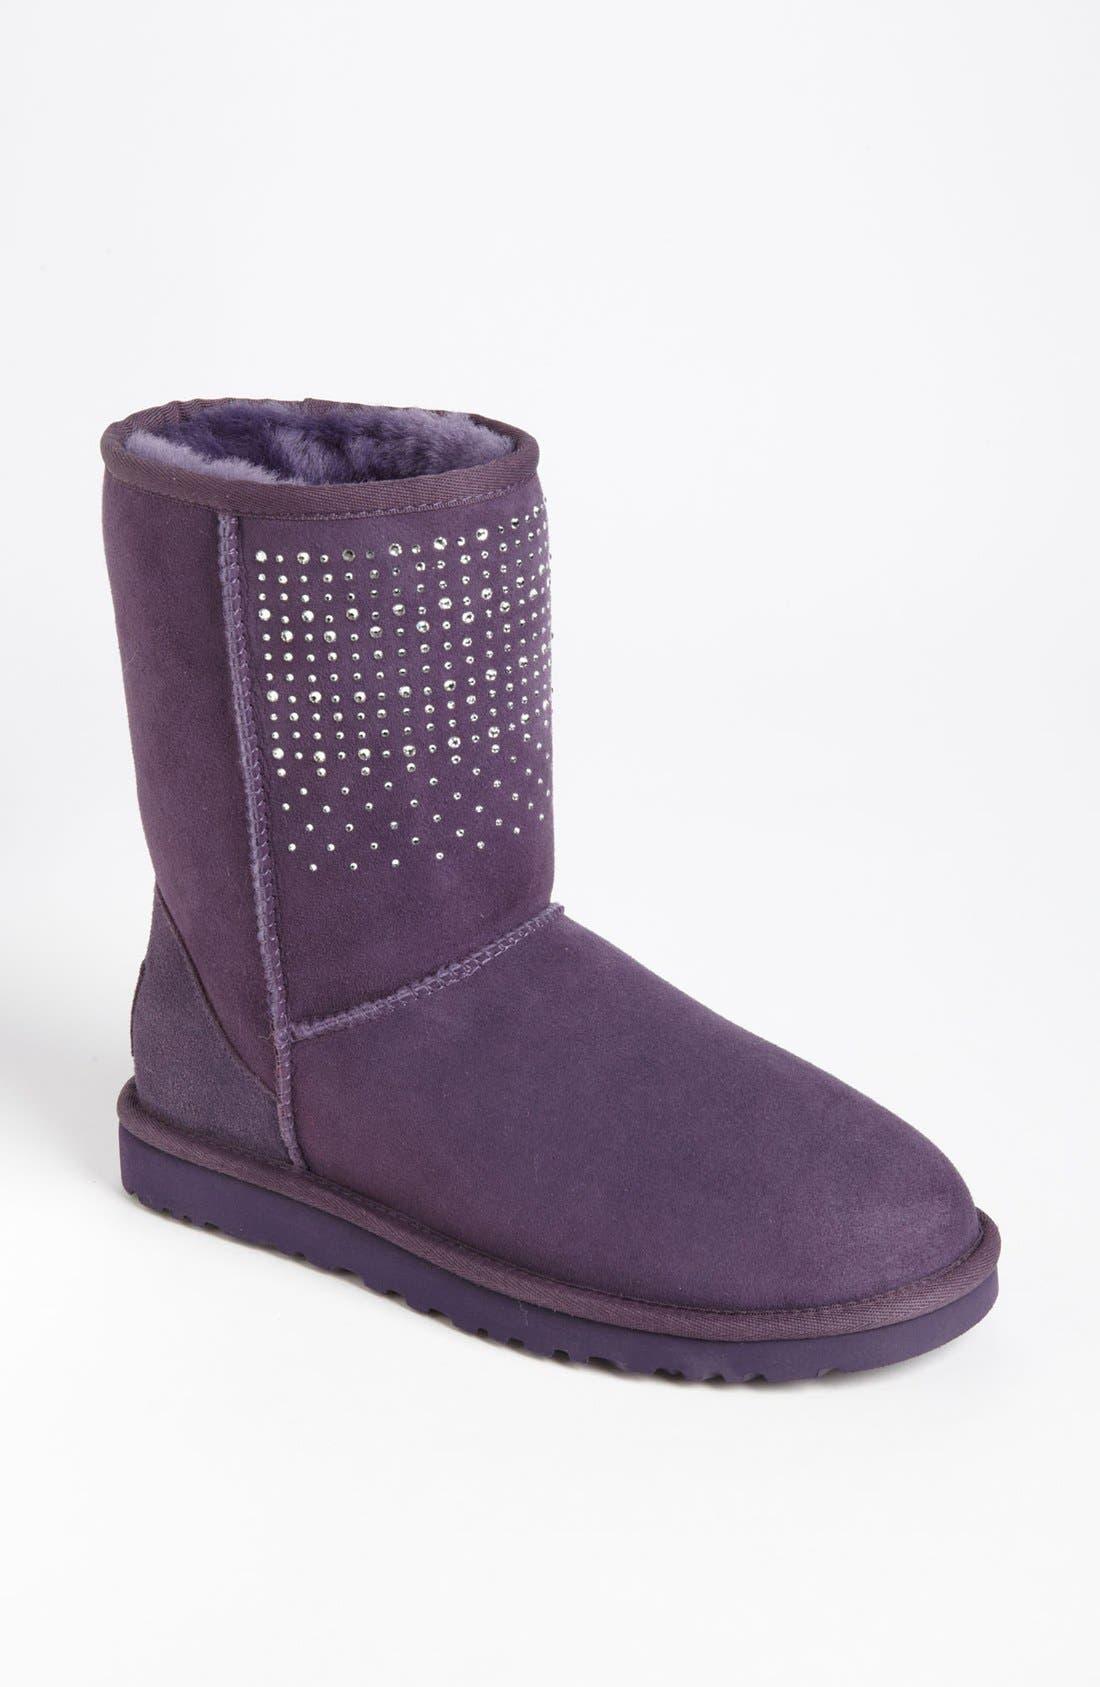 Main Image - UGG® Australia 'Classic Short Bling' Boot (Women)